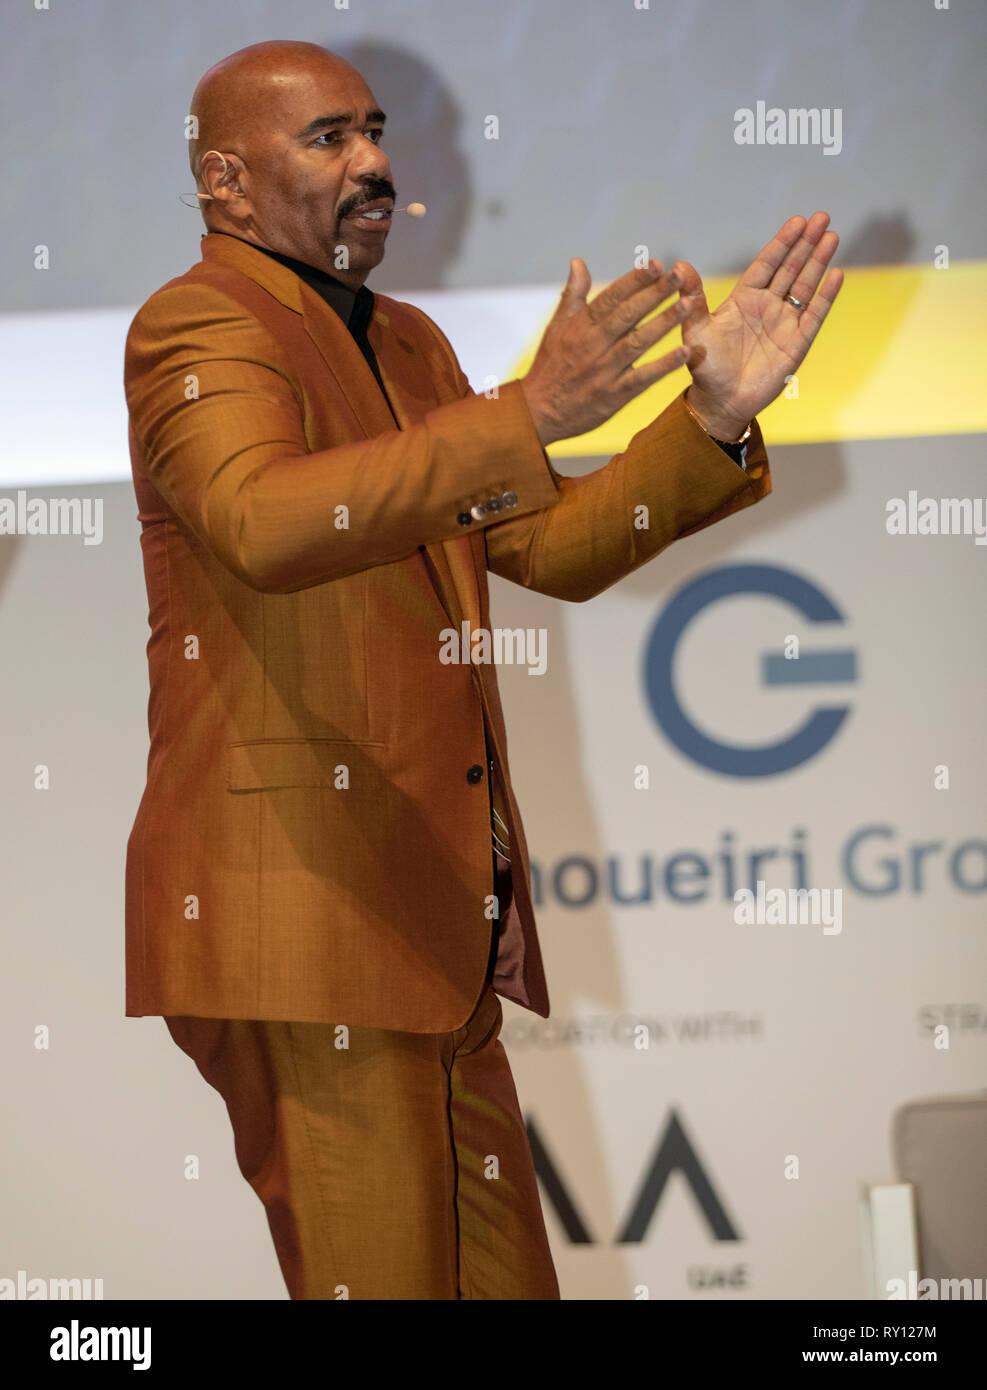 Dubai, United Arab Emirates. 11th Mar, 2019. Steve Harvey, Entrepreneur, Author, Speaker attends Dubai Lynx - International Festival of Creativity, Credit: ifnm/Alamy Live News - Stock Image